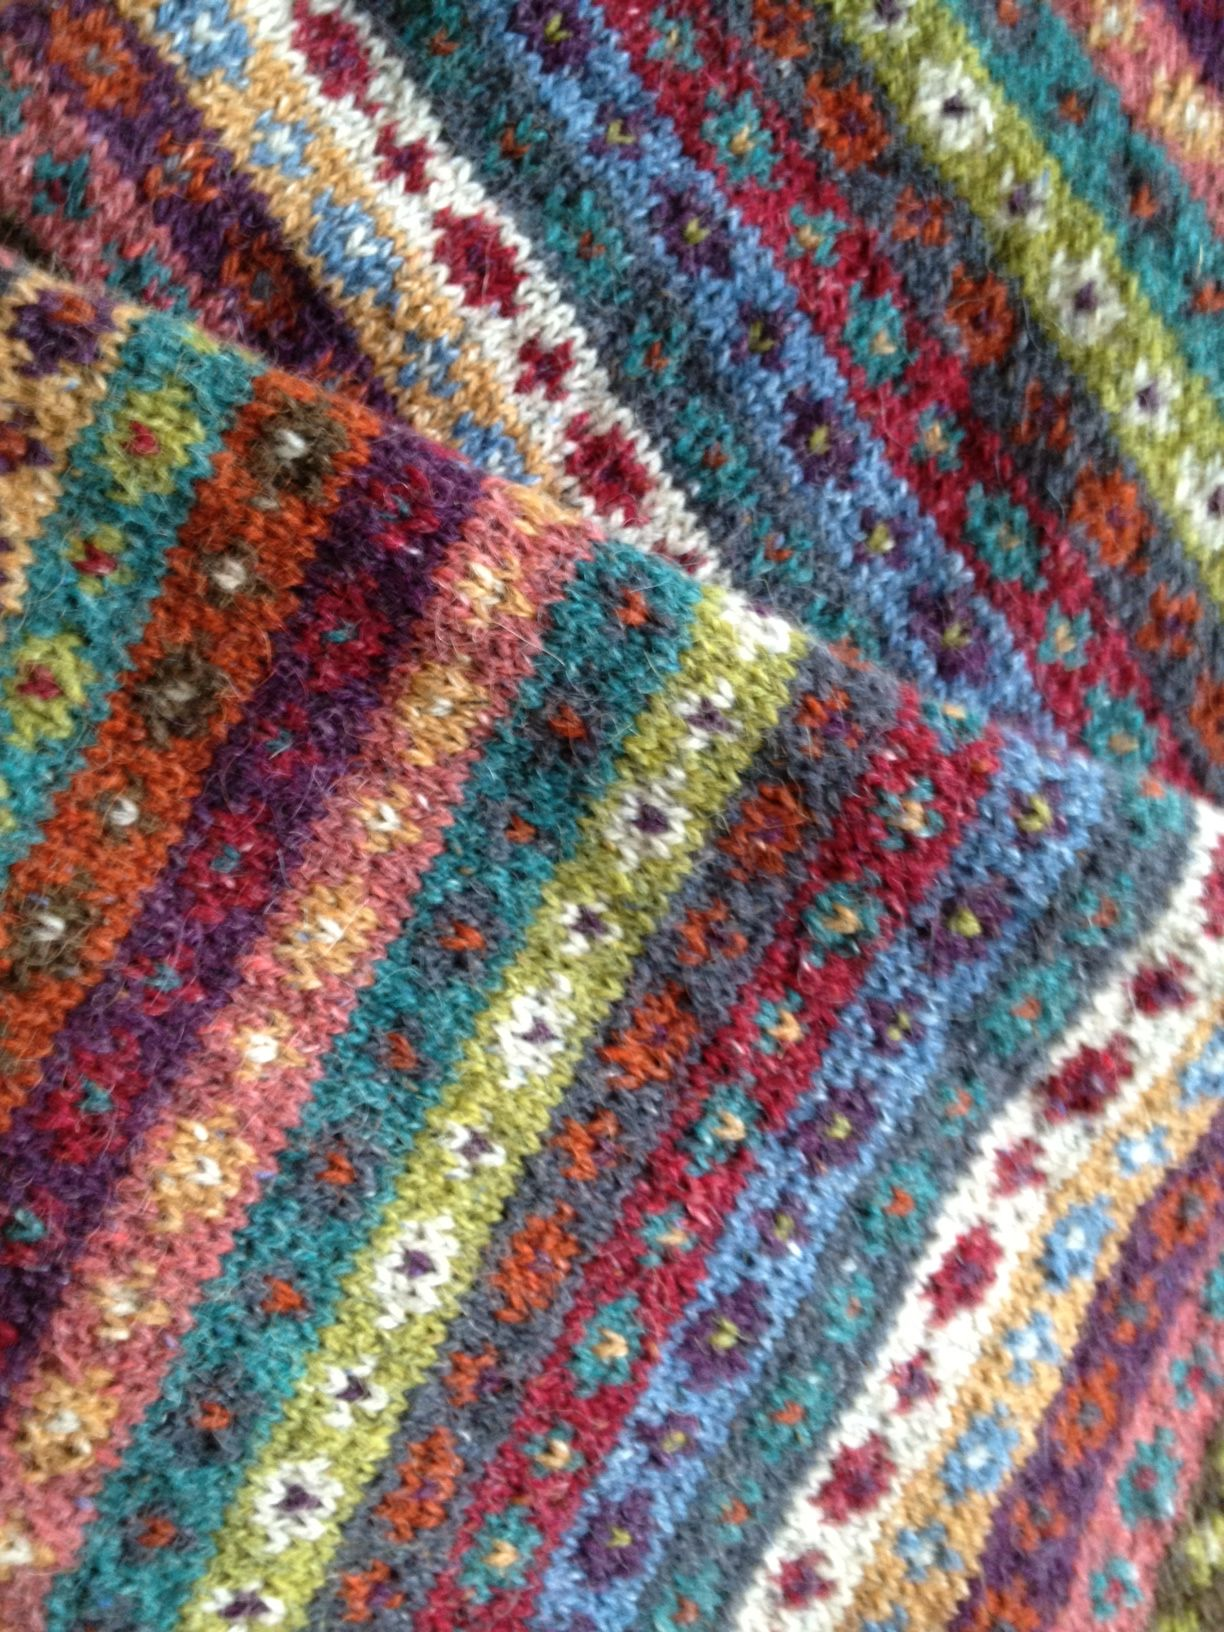 Kaffe Fassett | Emilia stickar | Baby knitting patterns